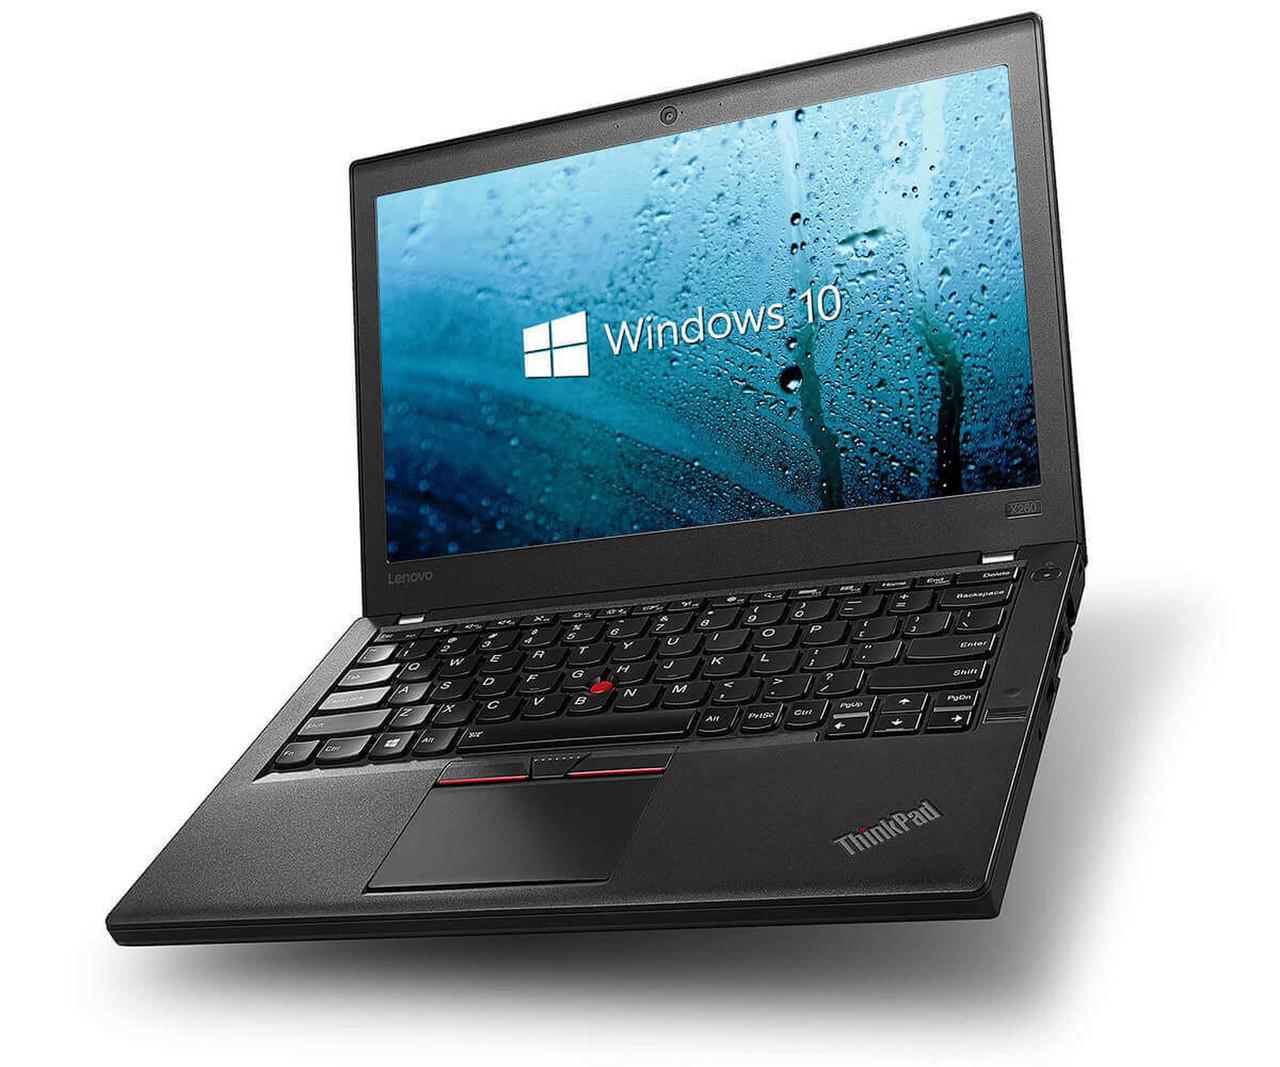 IBM Lenovo Thinkpad X260 Laptop Quad Core i7 2.6GHz, 8GB Ram, 250GB SSD, Windows 10 Pro 64 Ultrabook